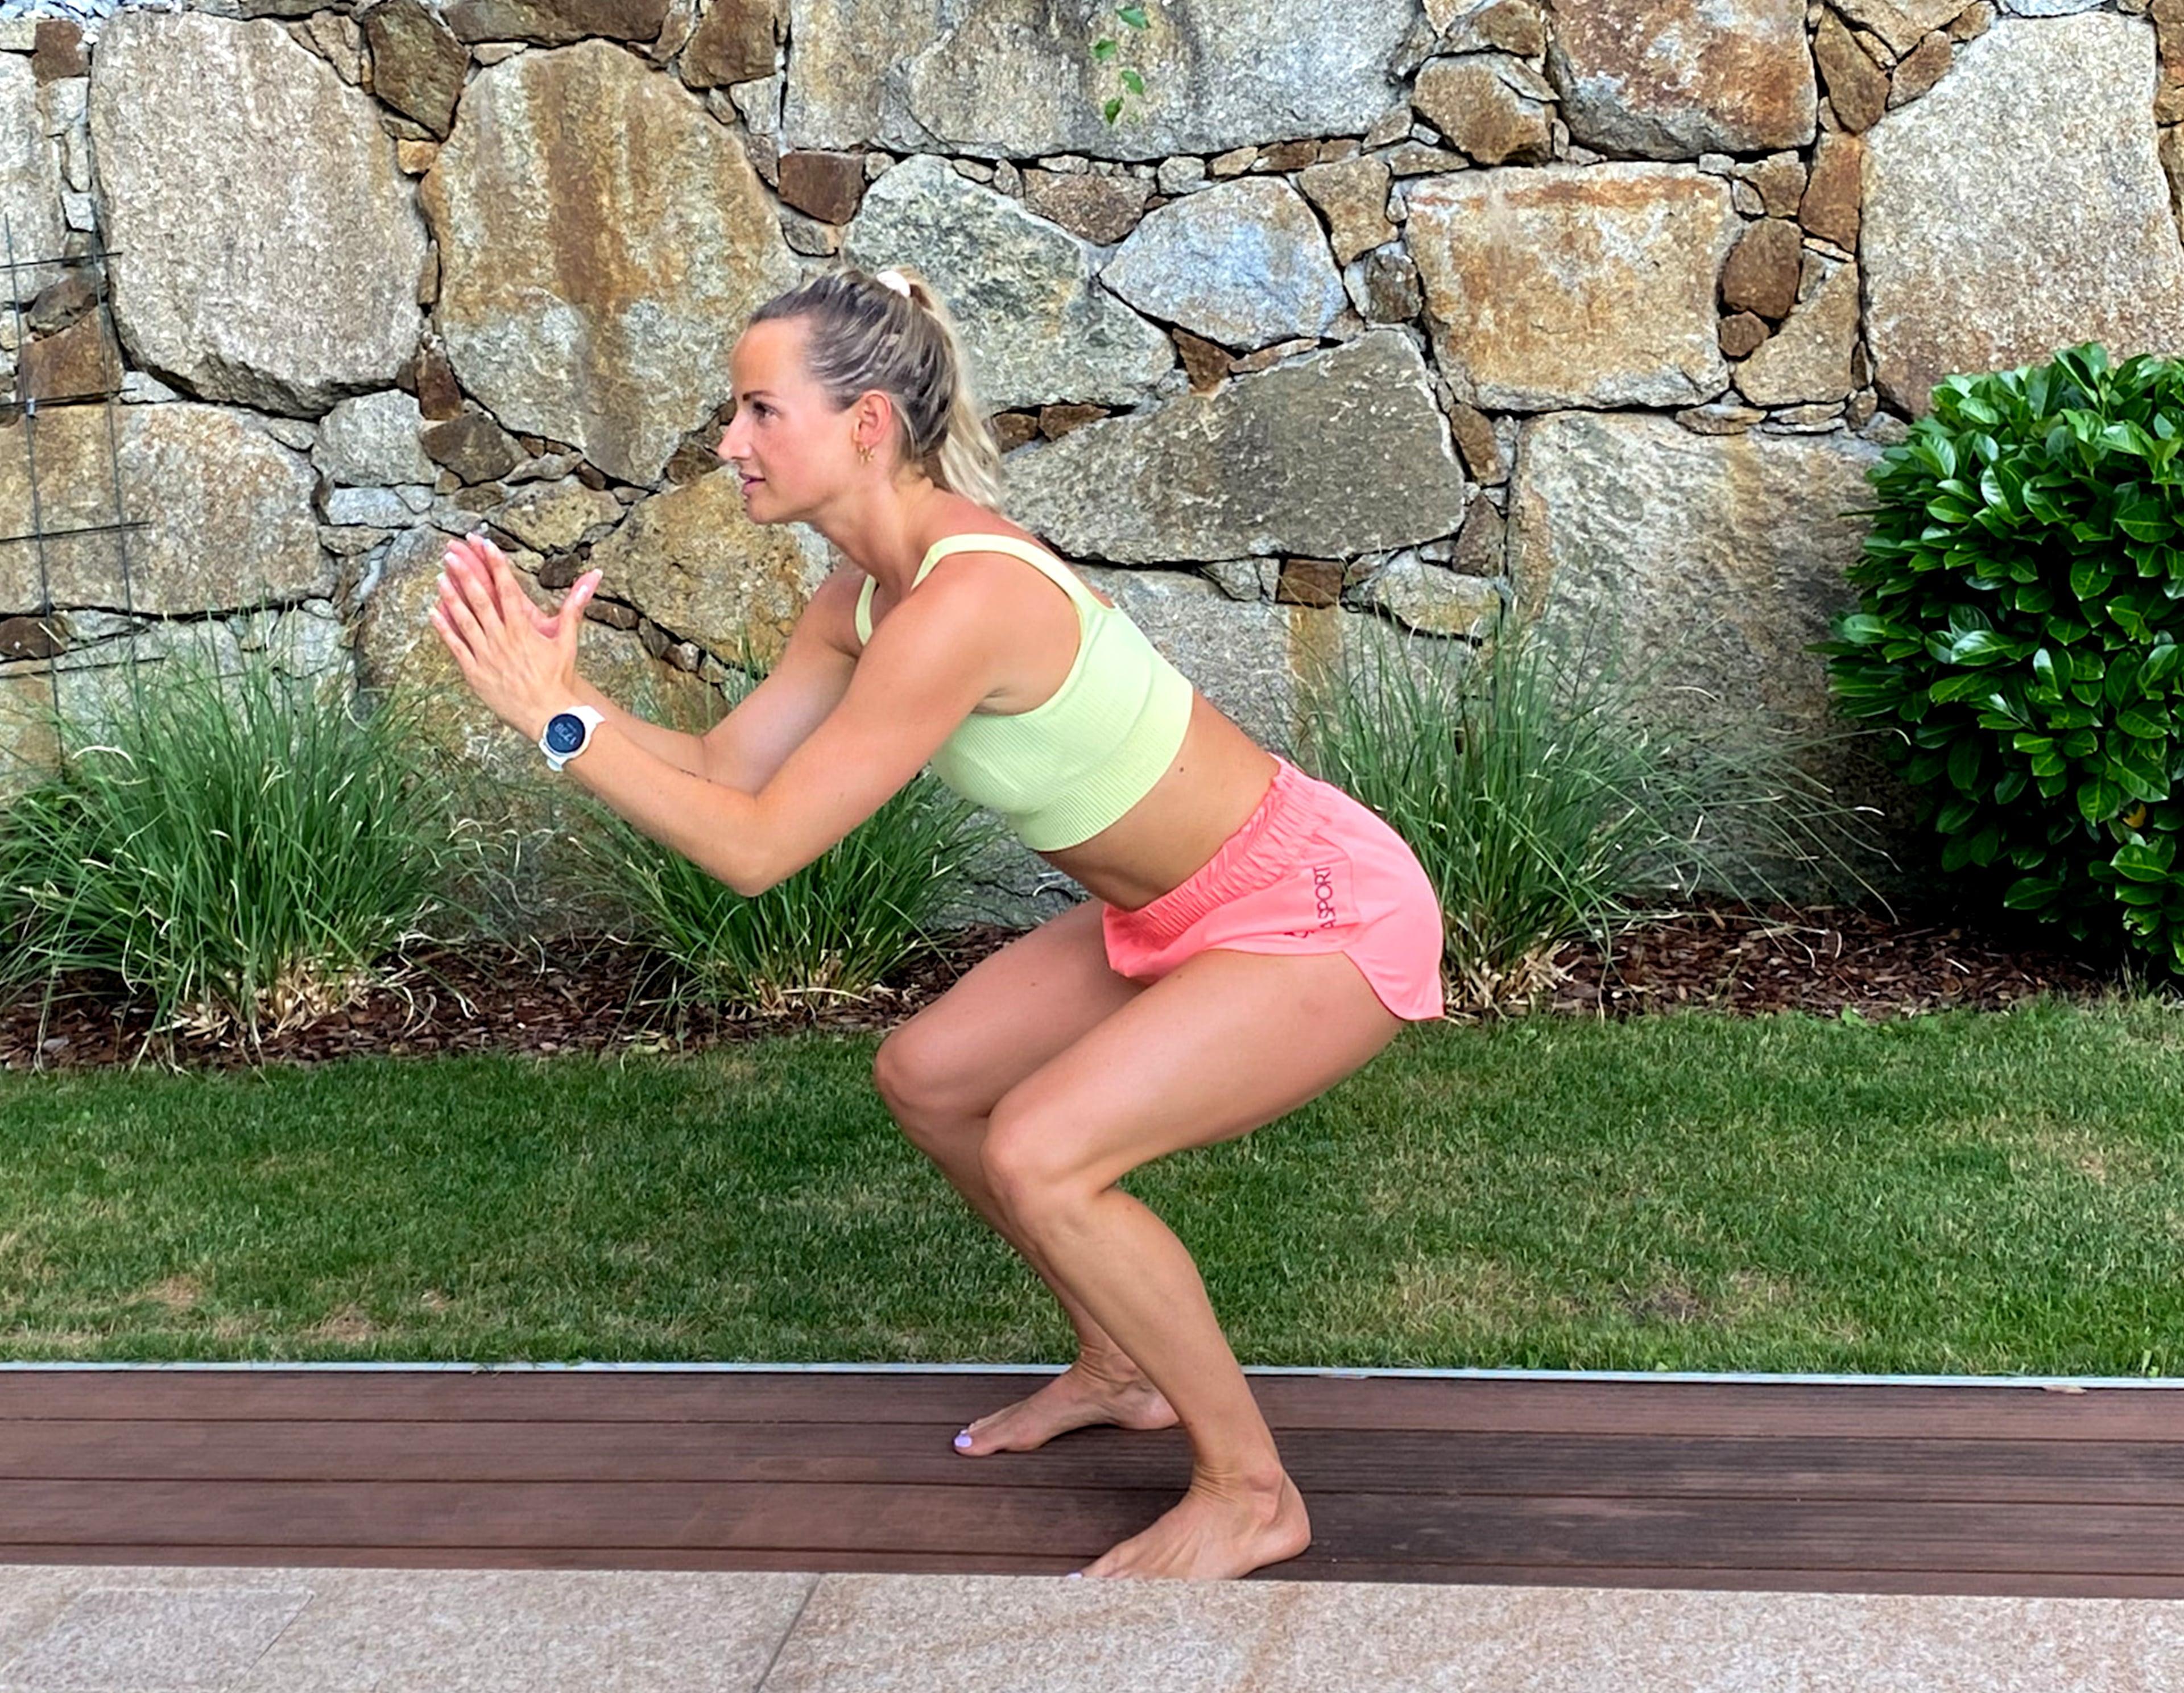 Bikinifigur City Magdalena Henkel menafit Sumo Squat Jump Endposition